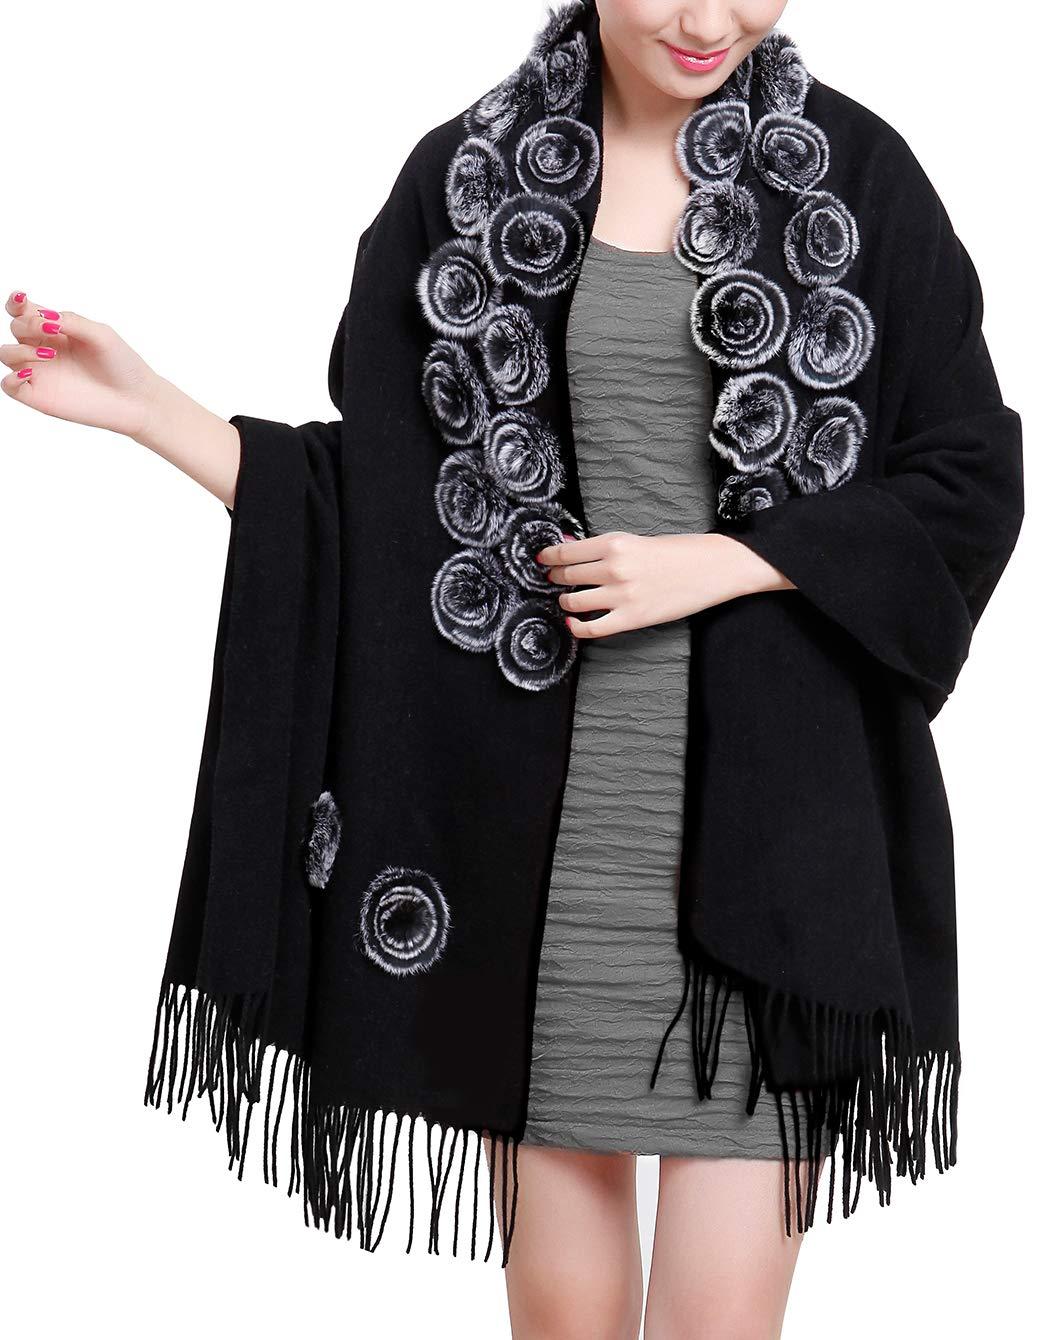 MORCOE Women's Exotic Design 100% Wool Rabbit Fur Roses Soft Scarf Warm Wrap Evening Party Pashmina Shawl Gift (Black)